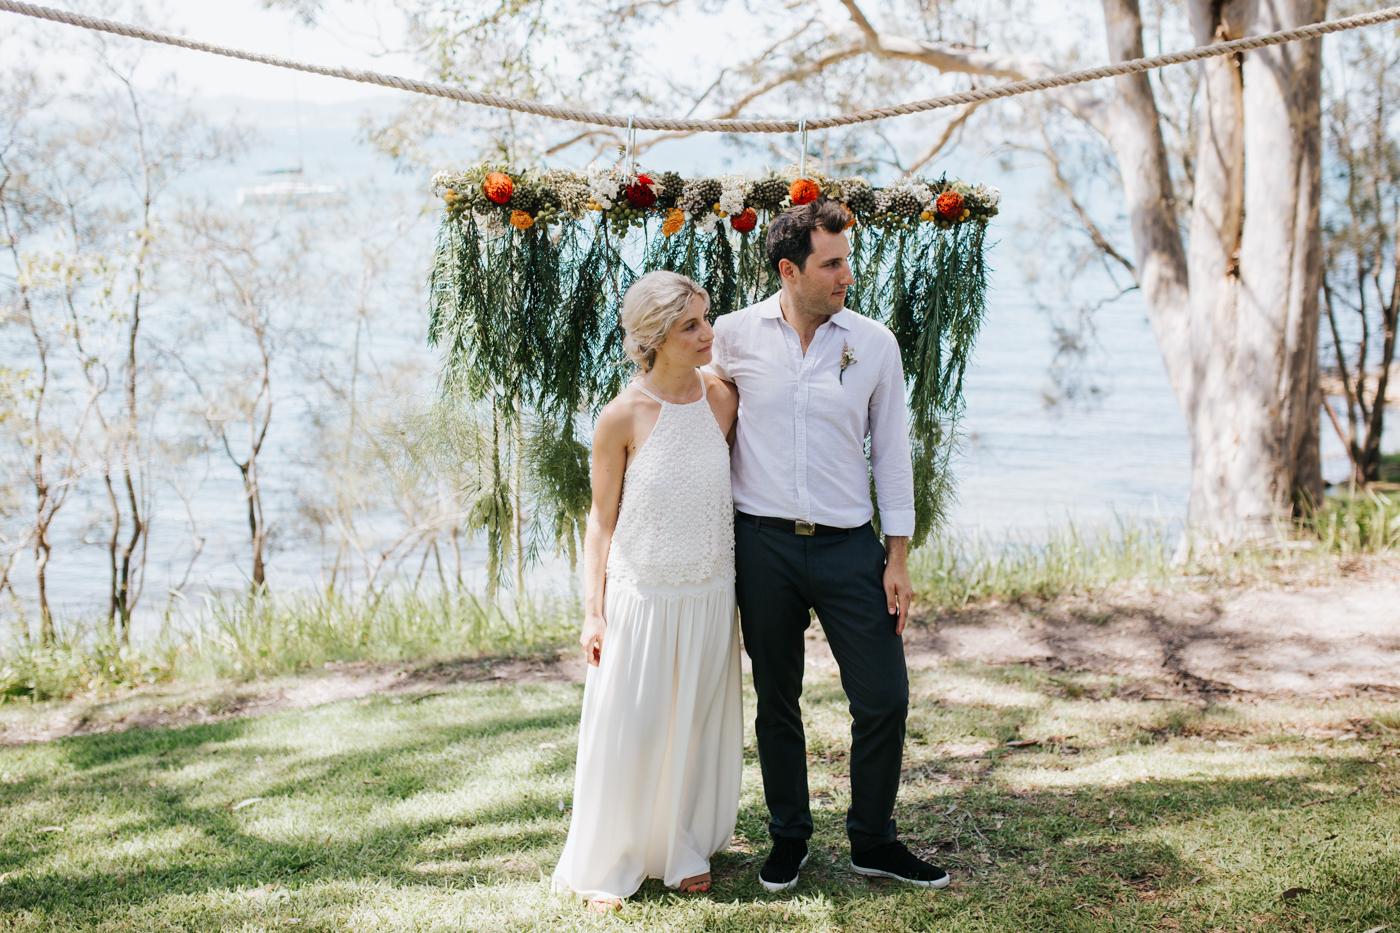 Emma & Ben - Lake Macquarie - Hunter Valley Wedding - Samantha Heather Photography-120.jpg